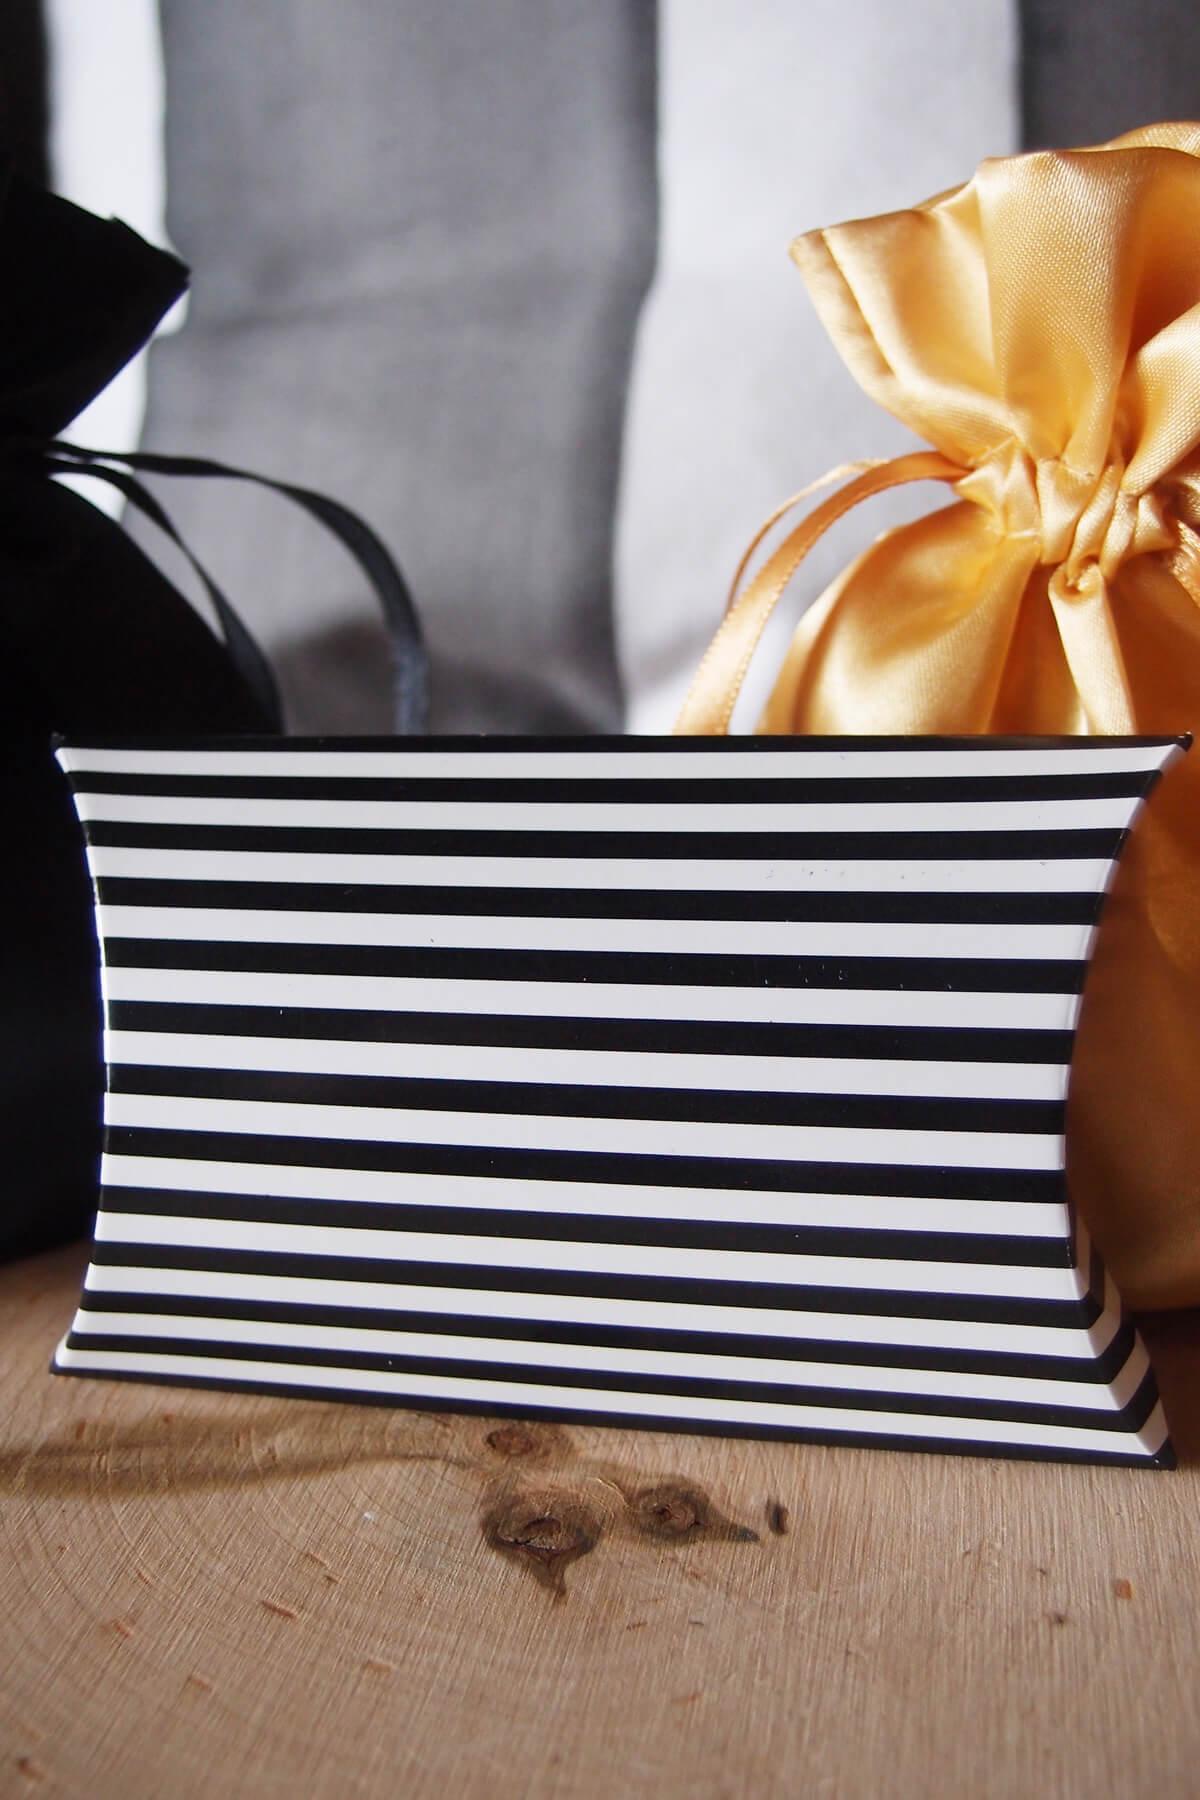 12 Black  White Striped Pillow Favor Boxes